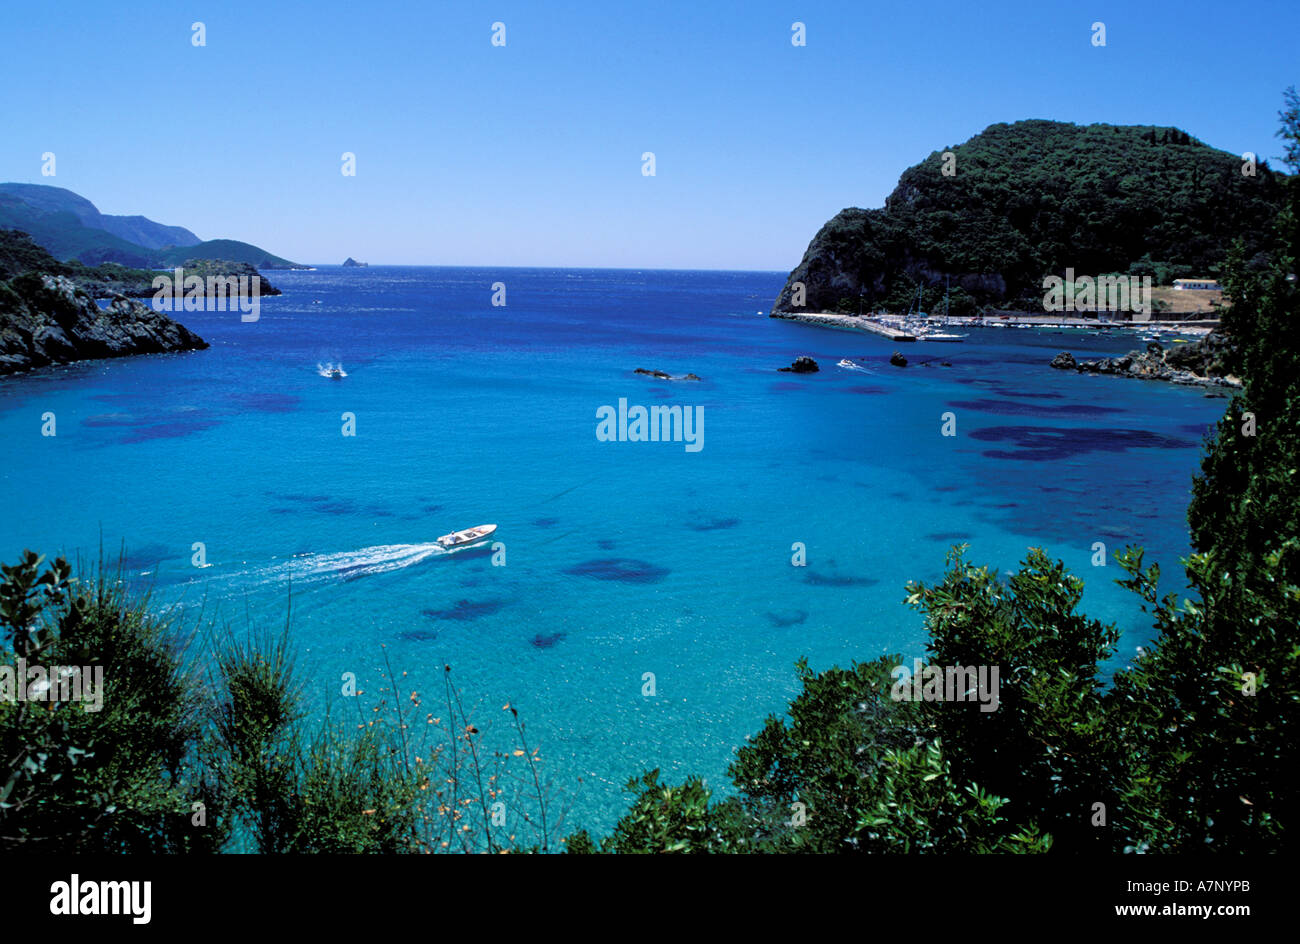 Greece, Ionian Islands, Corfou, Paleokatrista bay - Stock Image